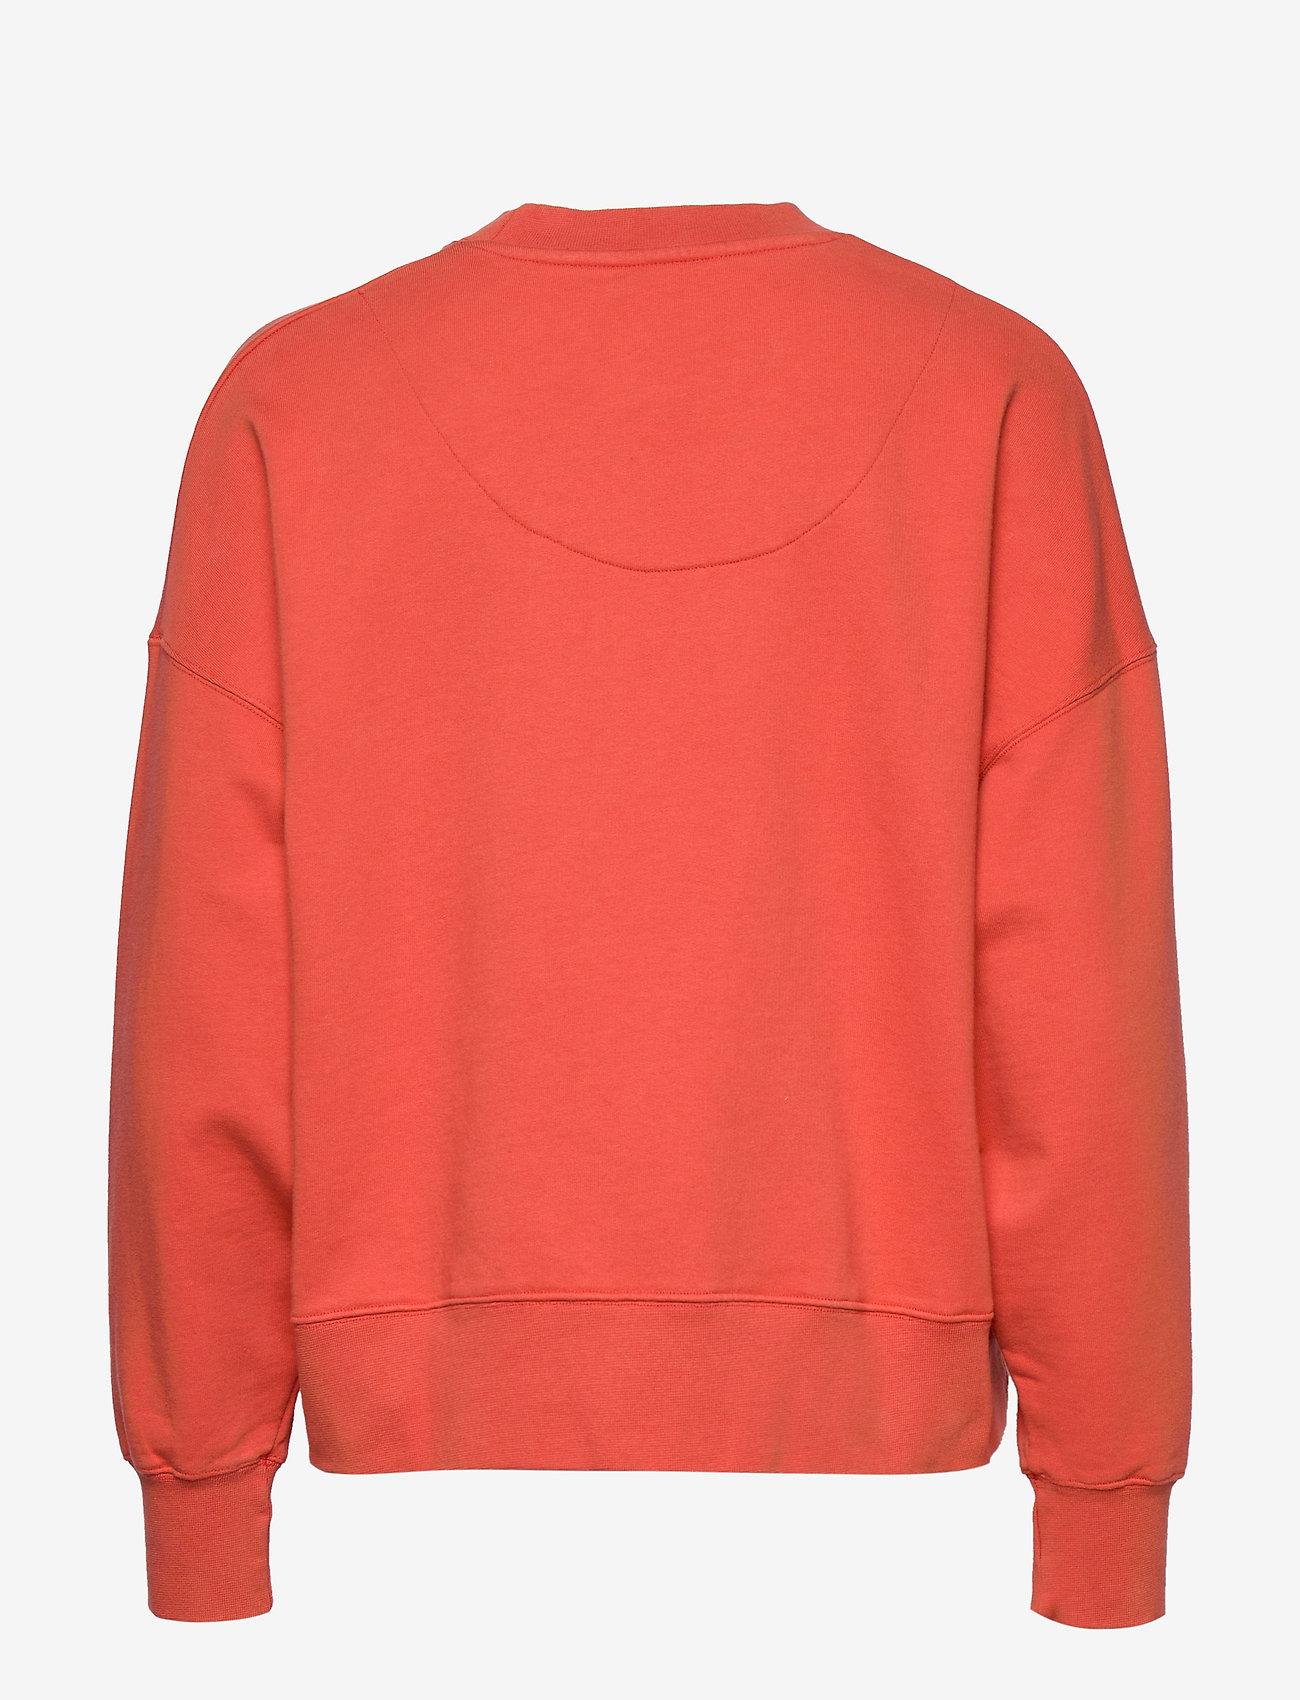 Wood Wood - Patti sweatshirt - sweatshirts - coral - 1